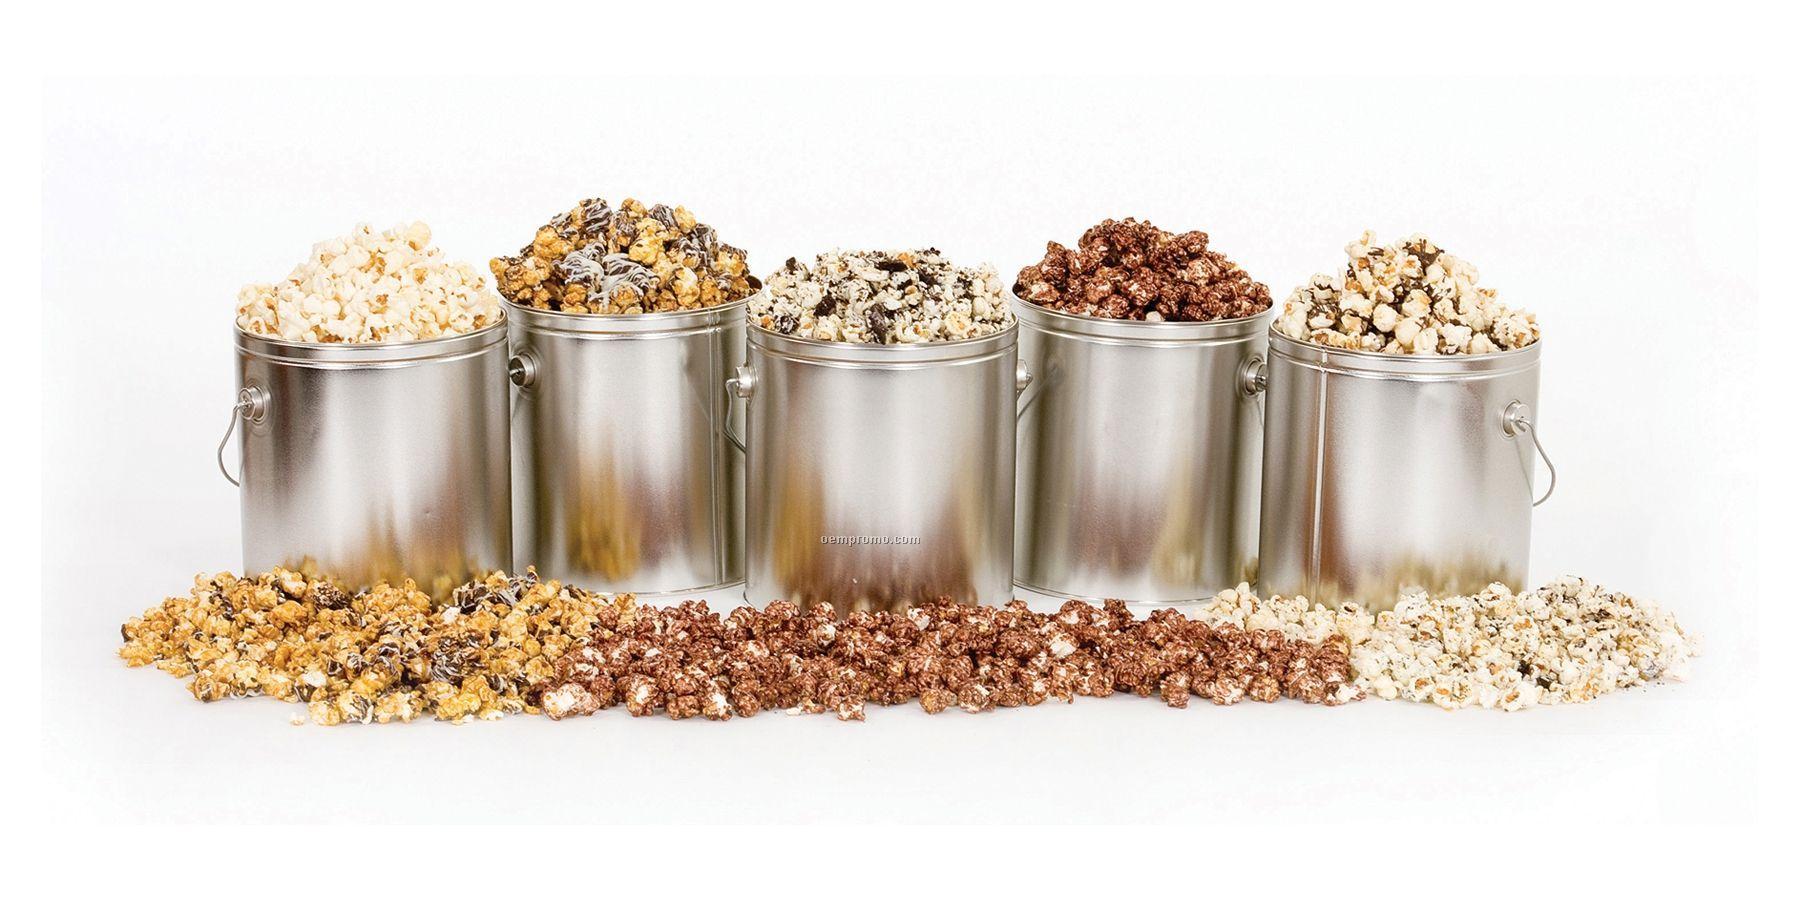 3 1/2 Gallon Caramel Chocolate Drizzle Flavored Kettle Corn